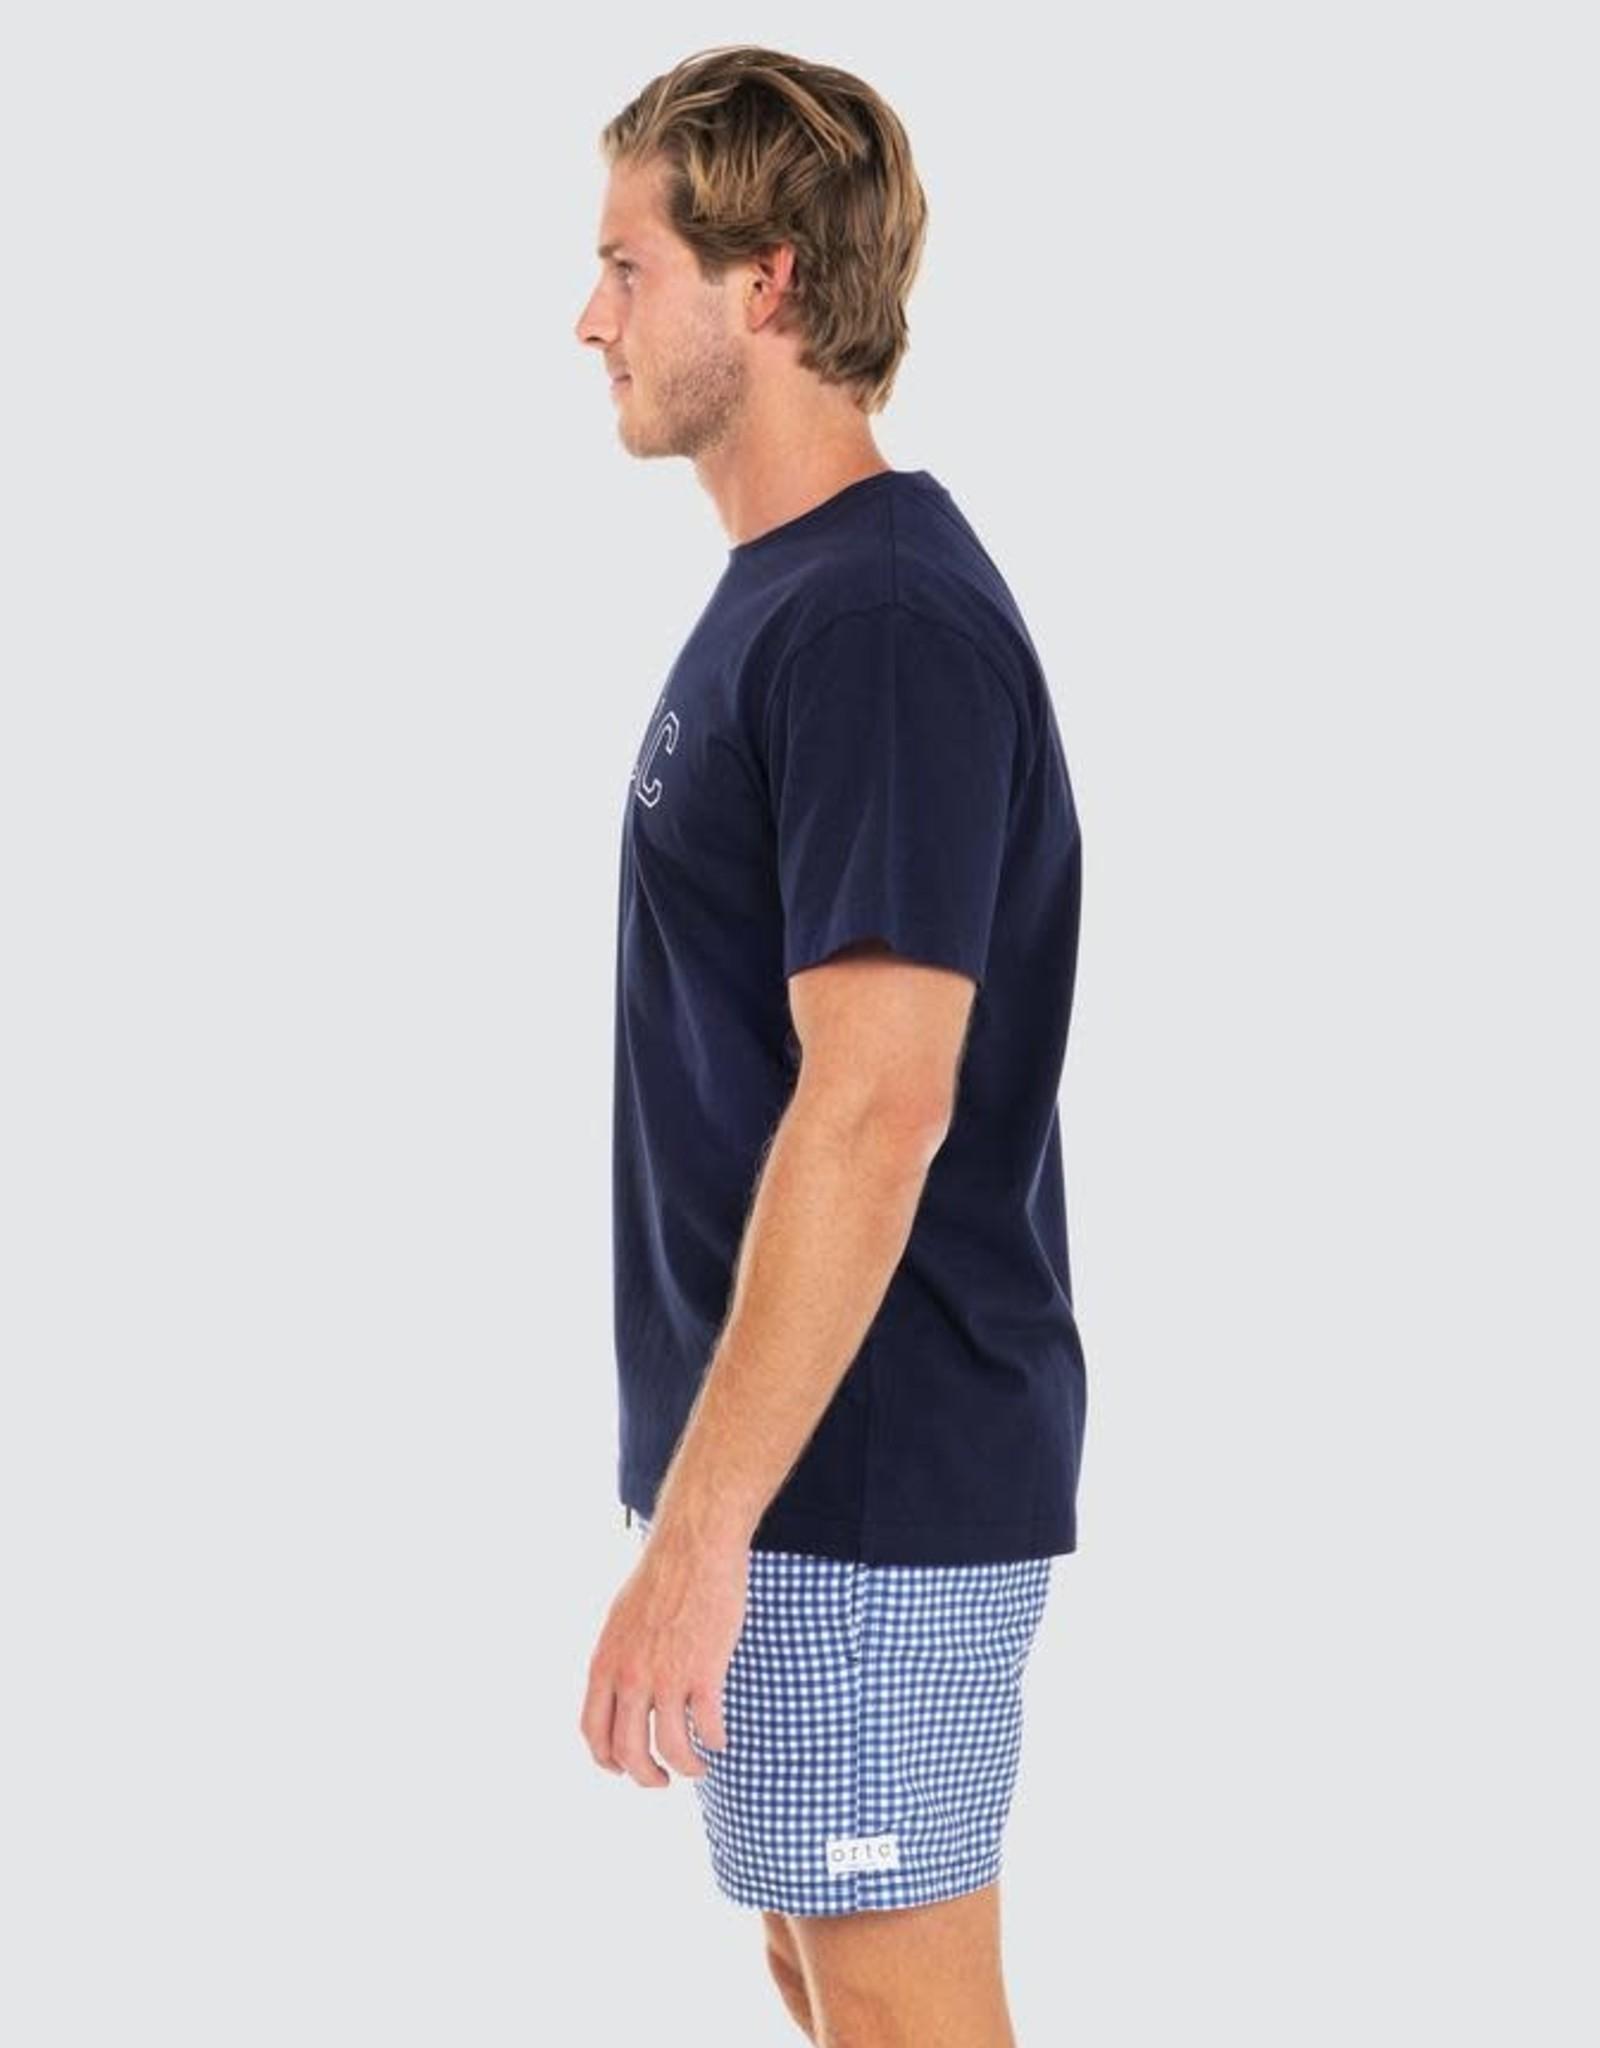 ORTC College T-Shirt